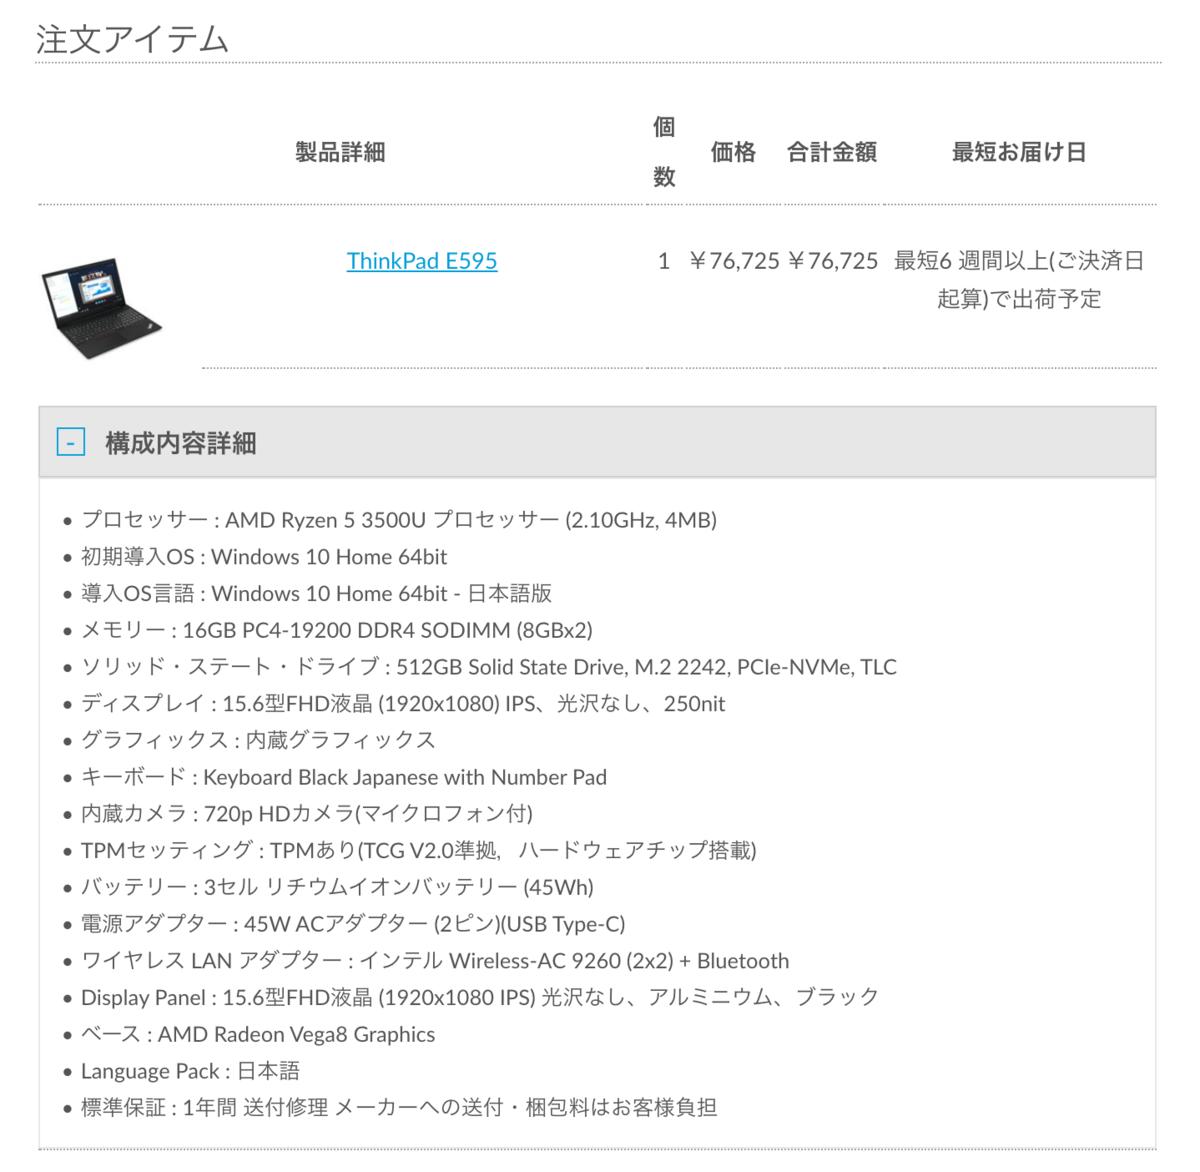 f:id:harunobuta:20201108144203p:plain